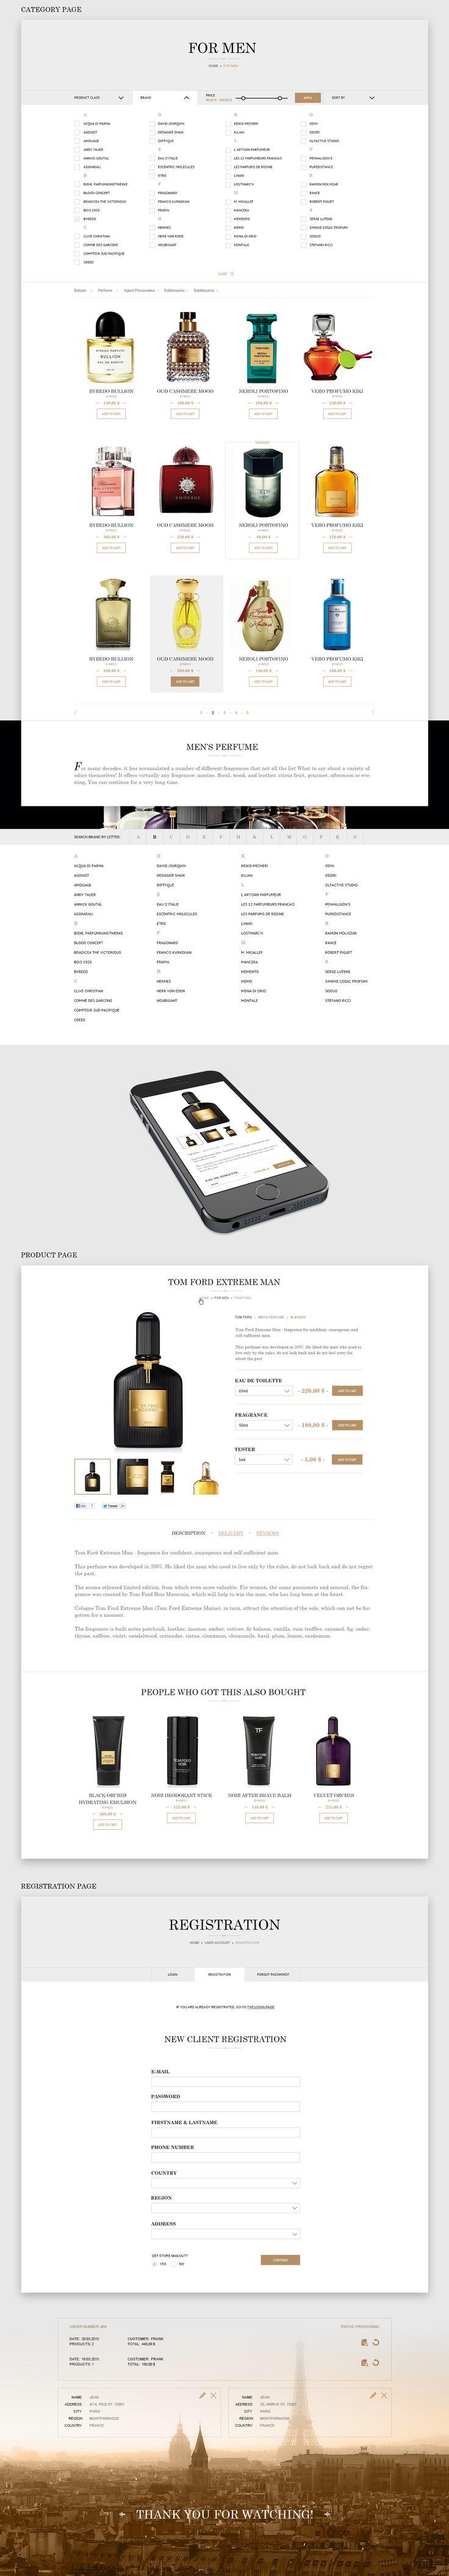 Online store luxury perfumes. on Behance